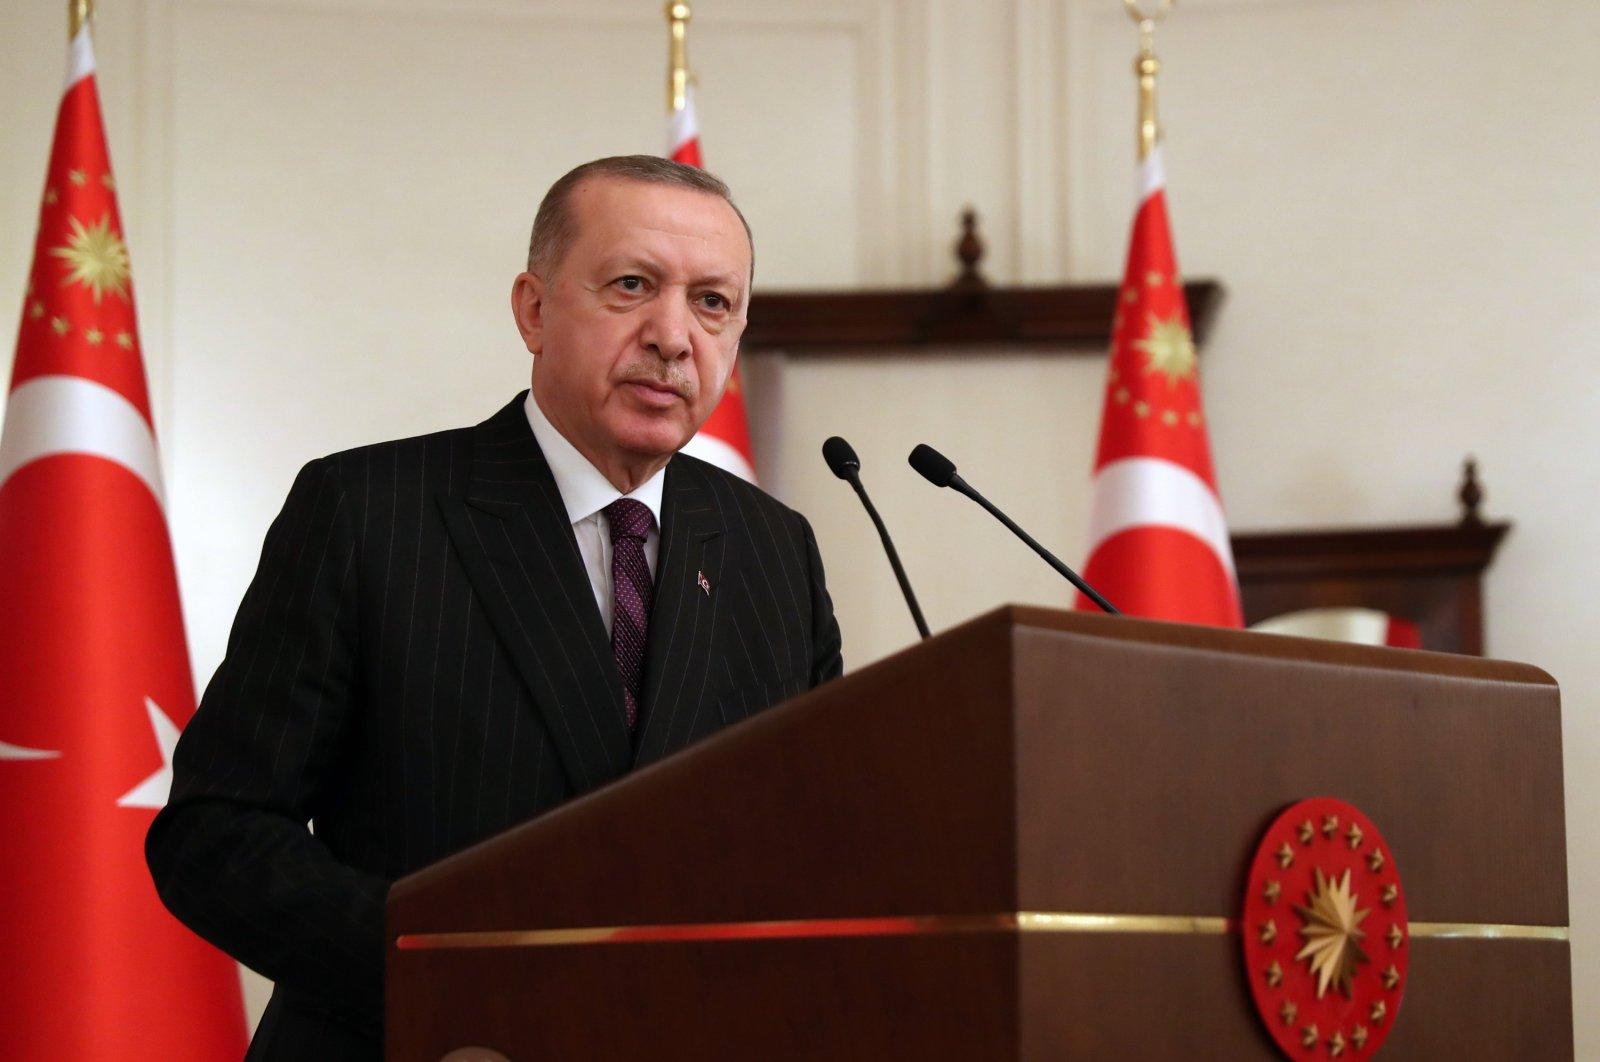 President Recep Tayyip Erdoğan addresses European Union ambassadors in the capital Ankara, Turkey, Jan. 12, 2021. (AA File Photo)